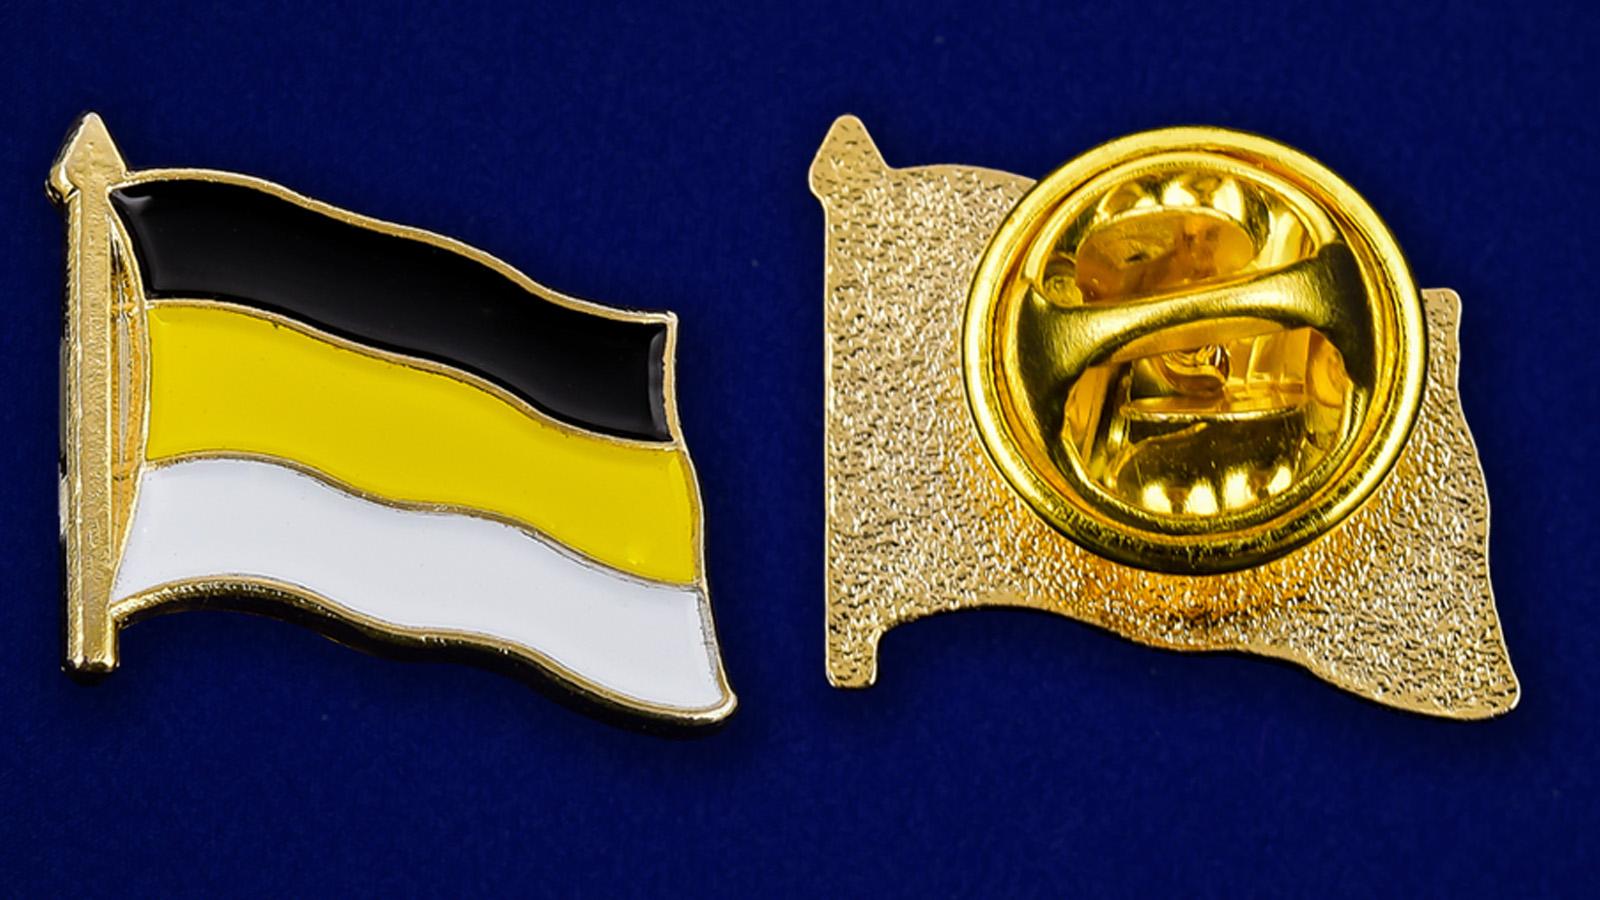 Значек в виде флага Российской ...: voenpro.ru/voentorg/znachok-v-vide-flaga-rossijskoj-imperii